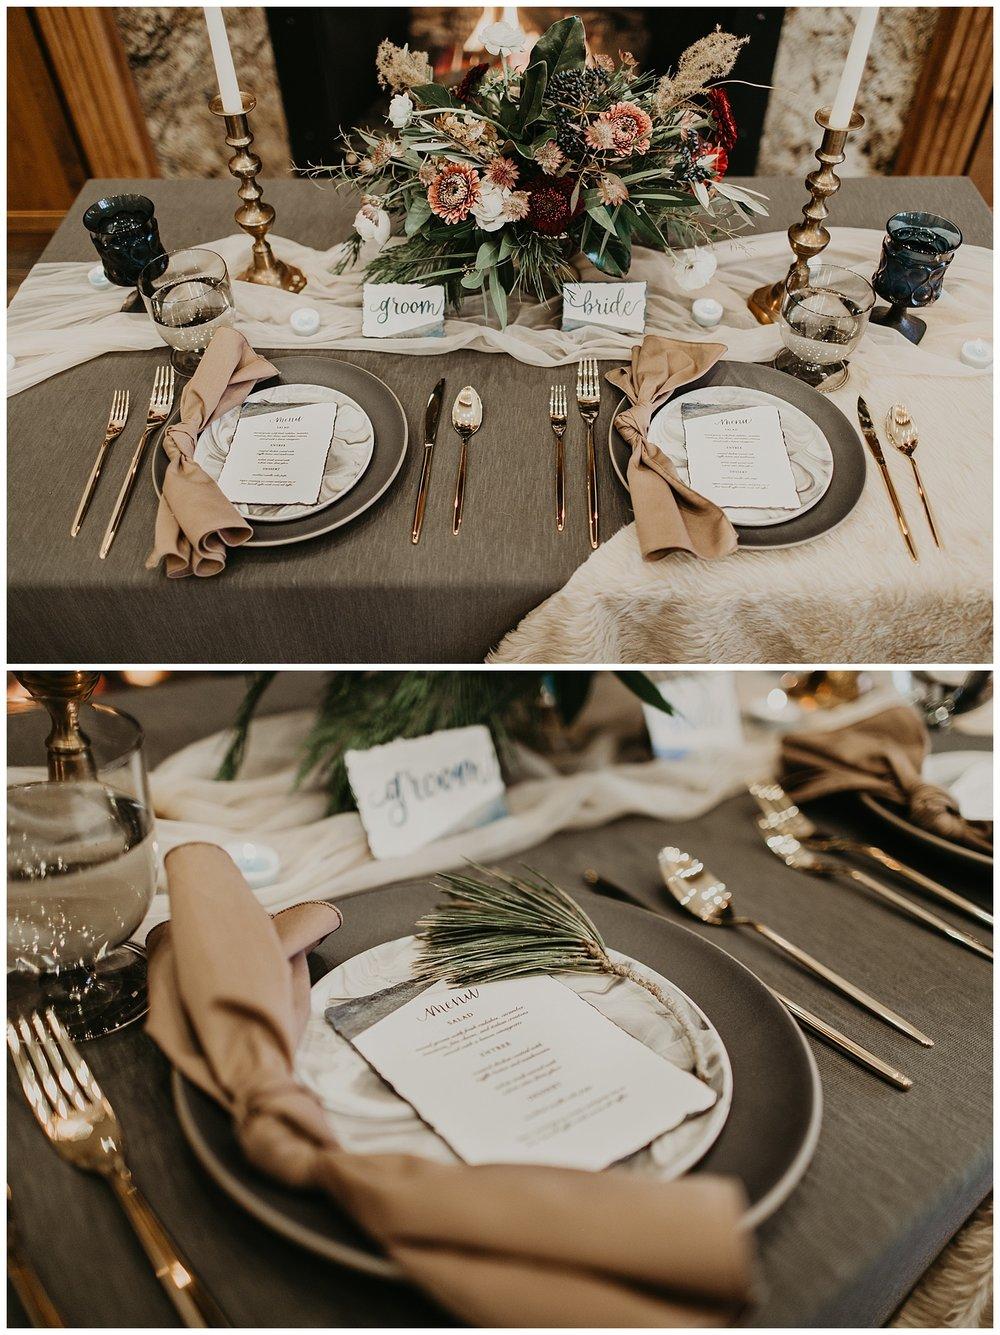 lake-tahoe-winter-wedding-boho-table-settings-inspiration.jpg